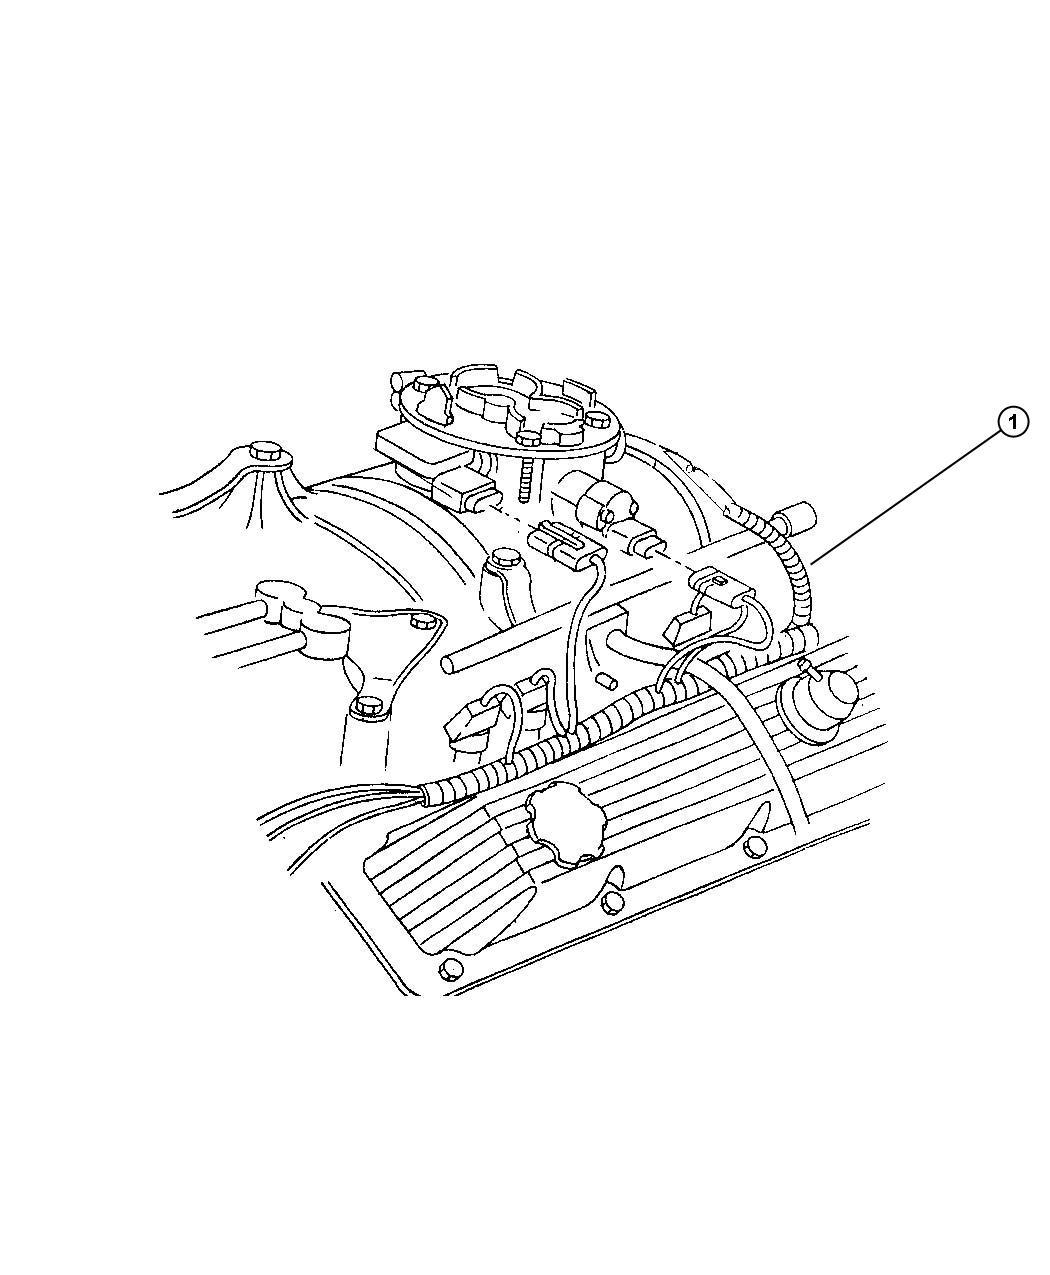 Dodge Ram Wiring Enginesel Emissions